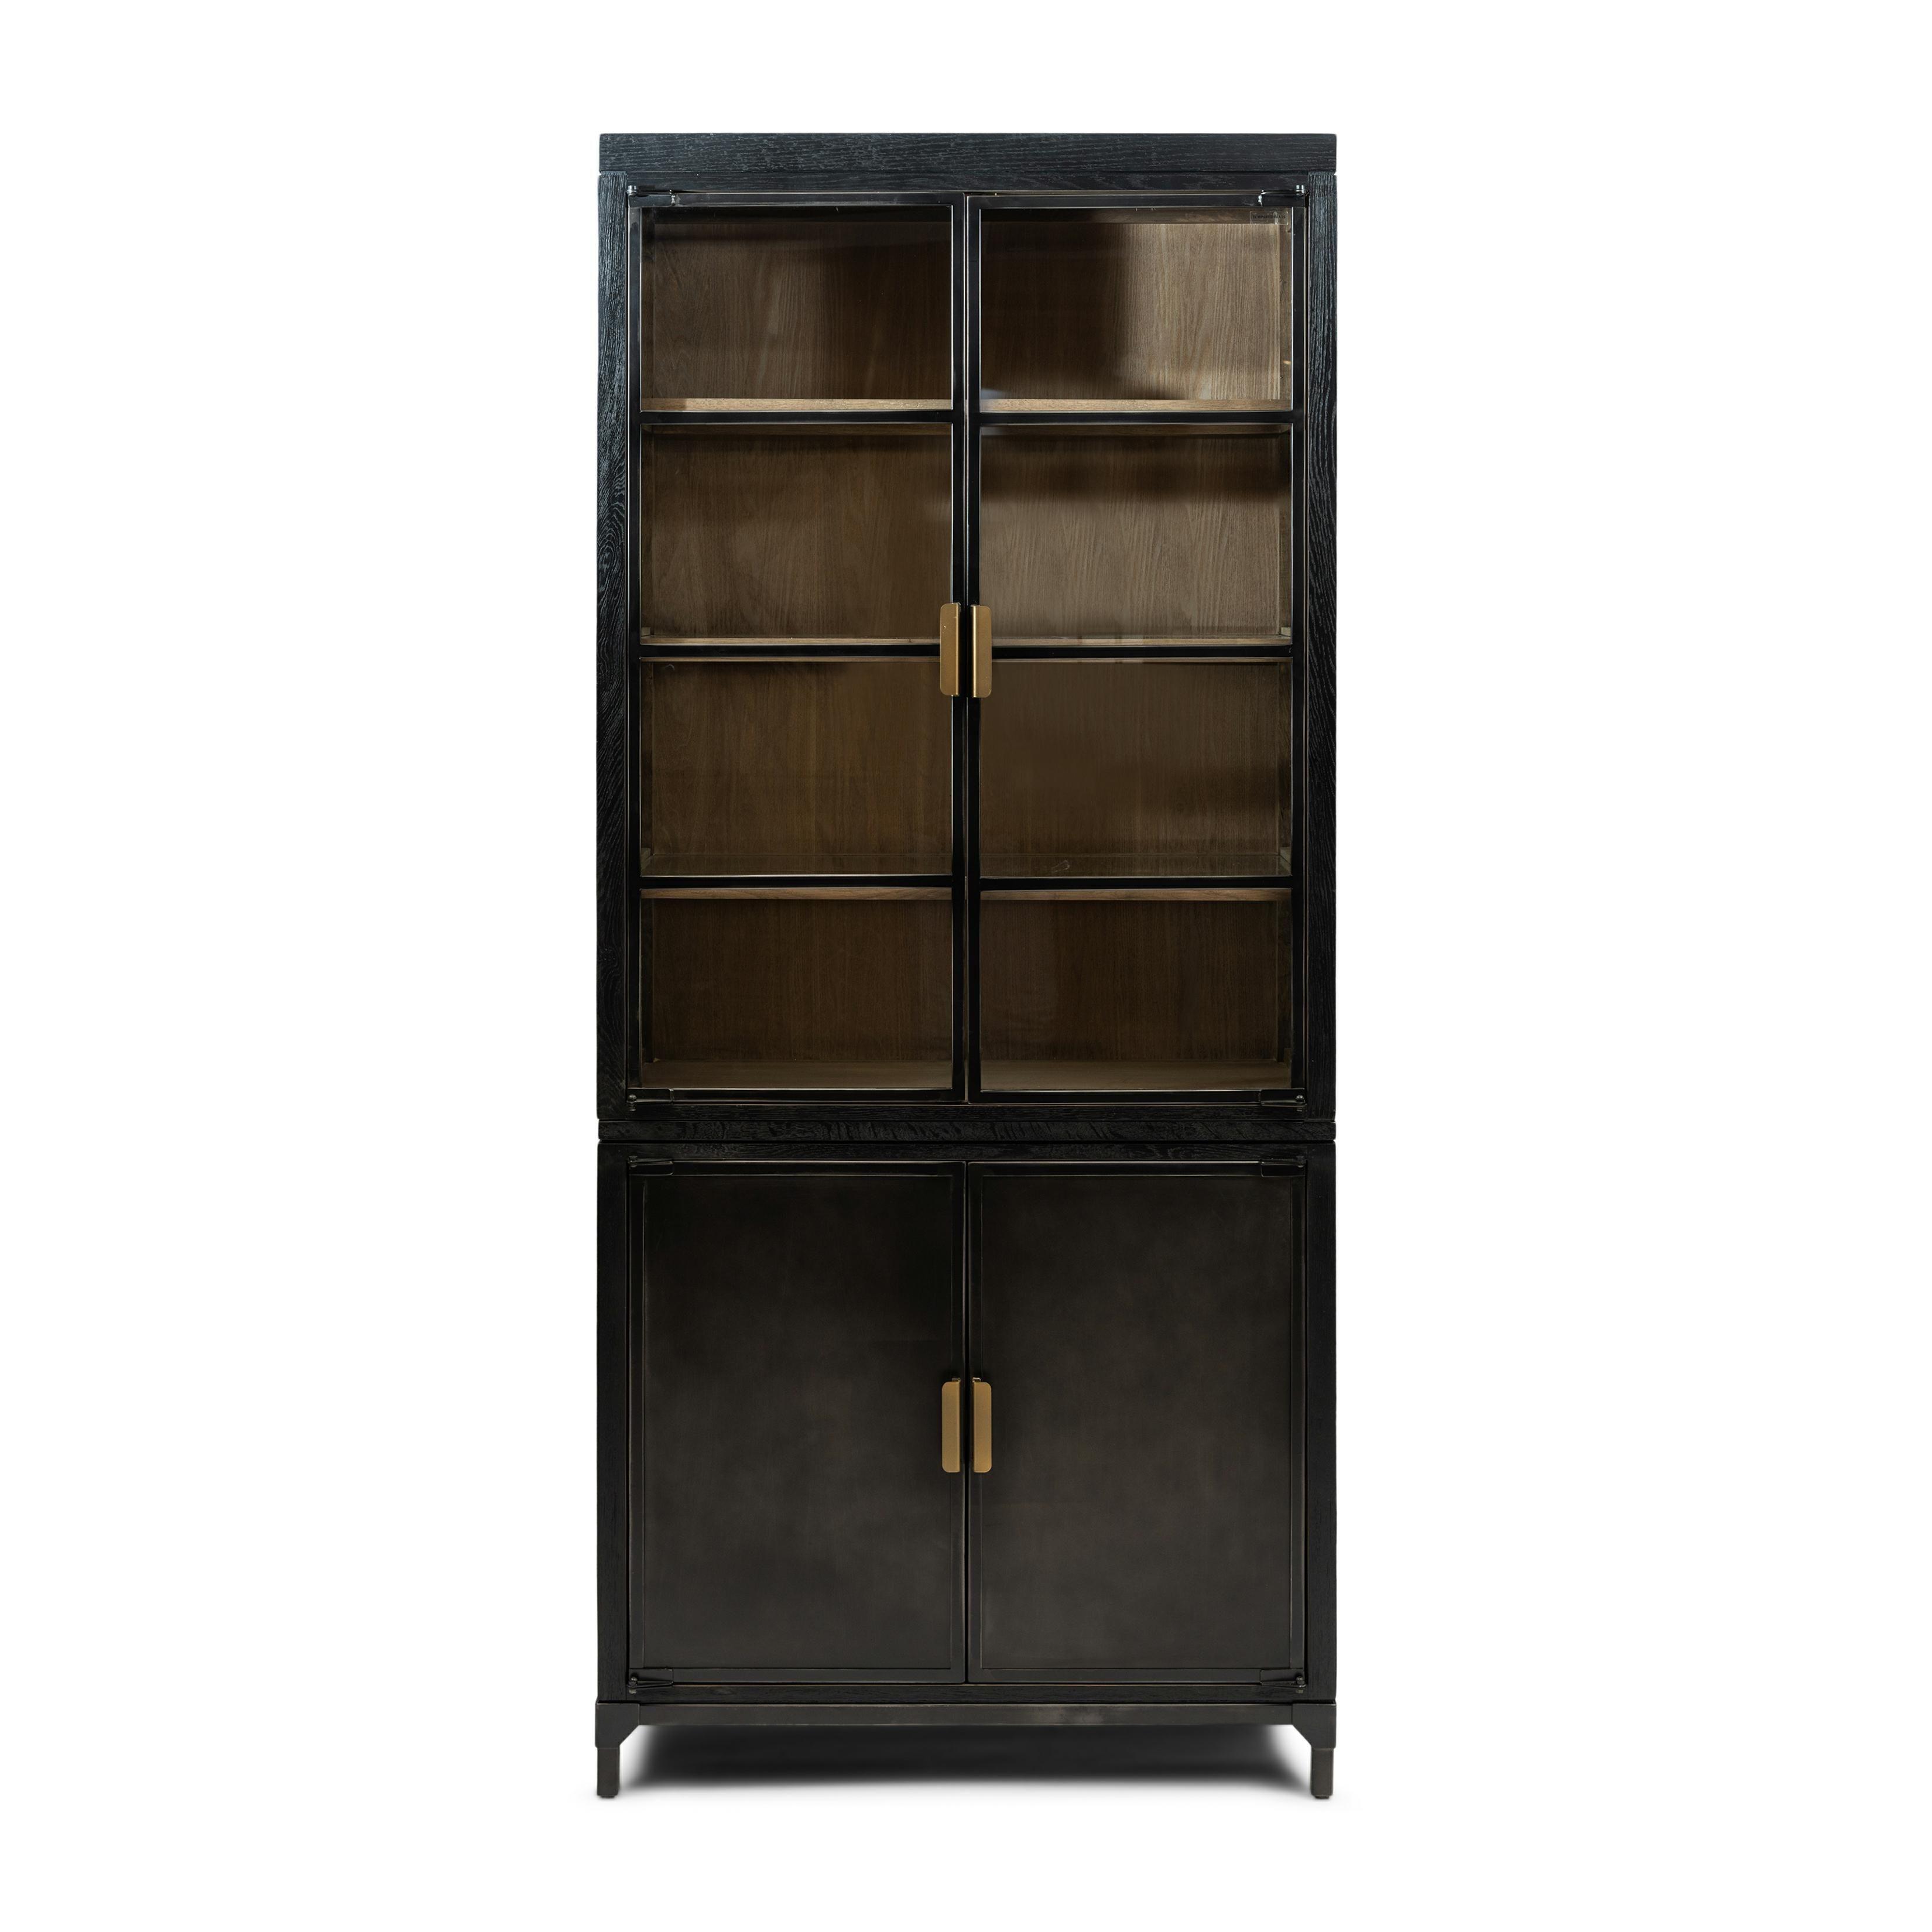 West Lake Cabinet / Rivièra Maison